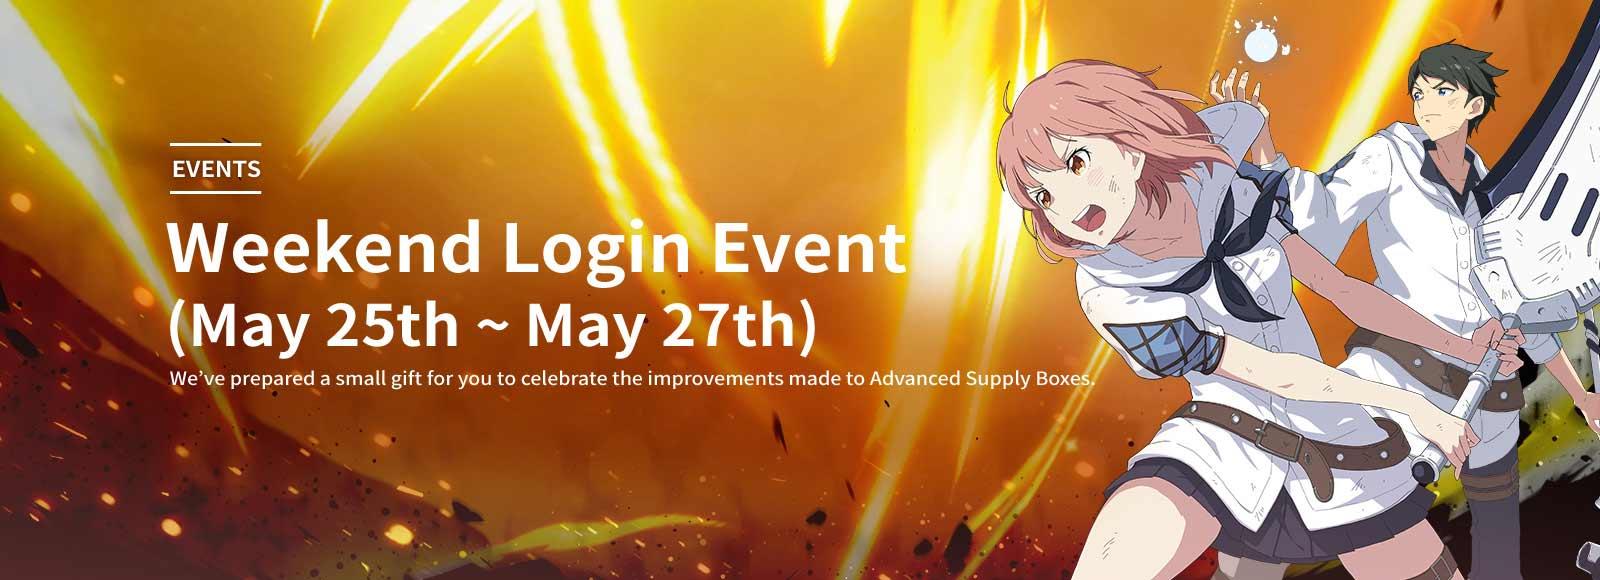 Weekend Login Event